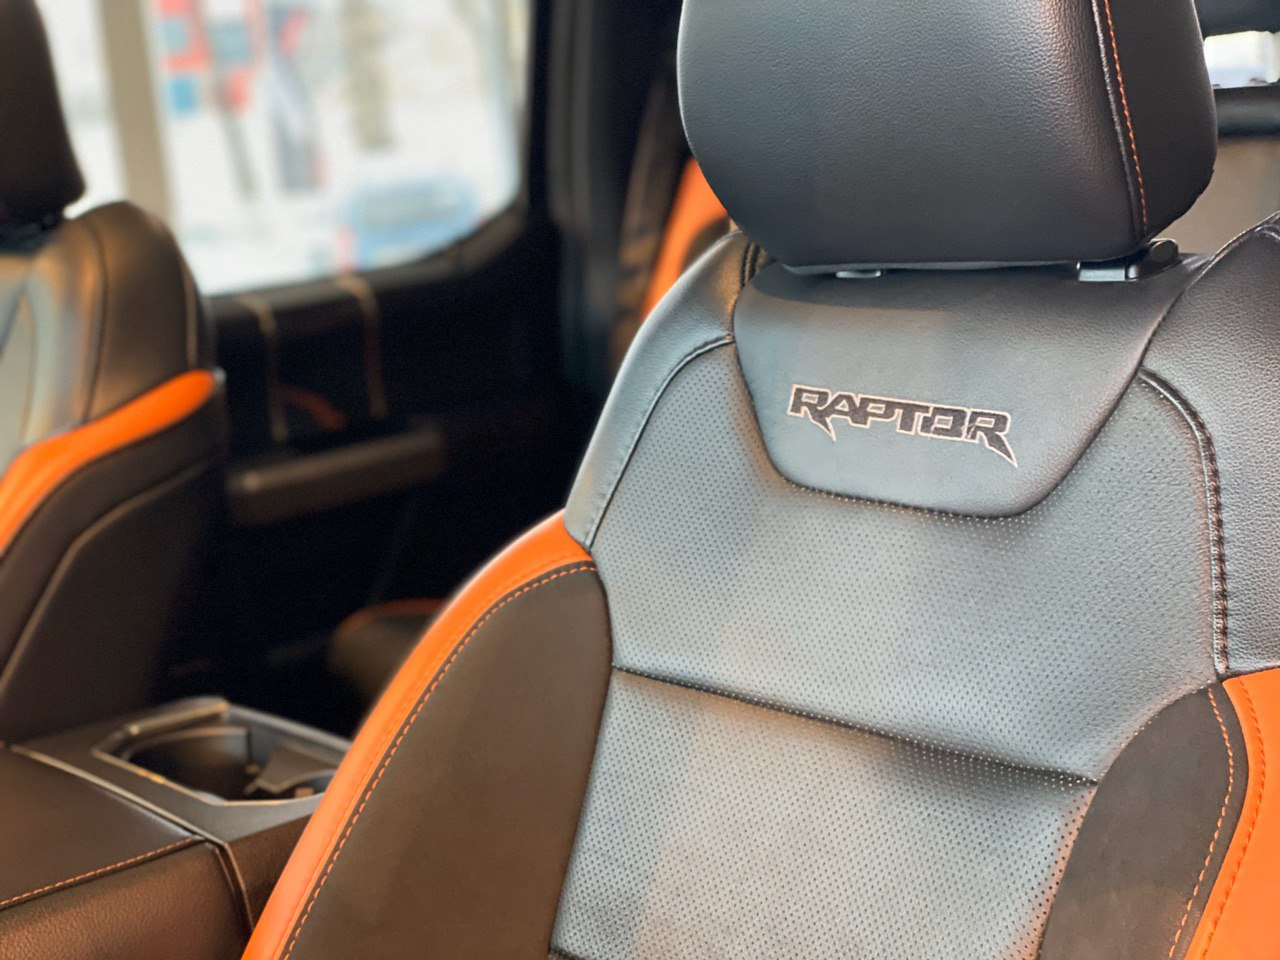 2018 Ford F150 Raptor | Vin: 1FTFW1RG9JFA12452